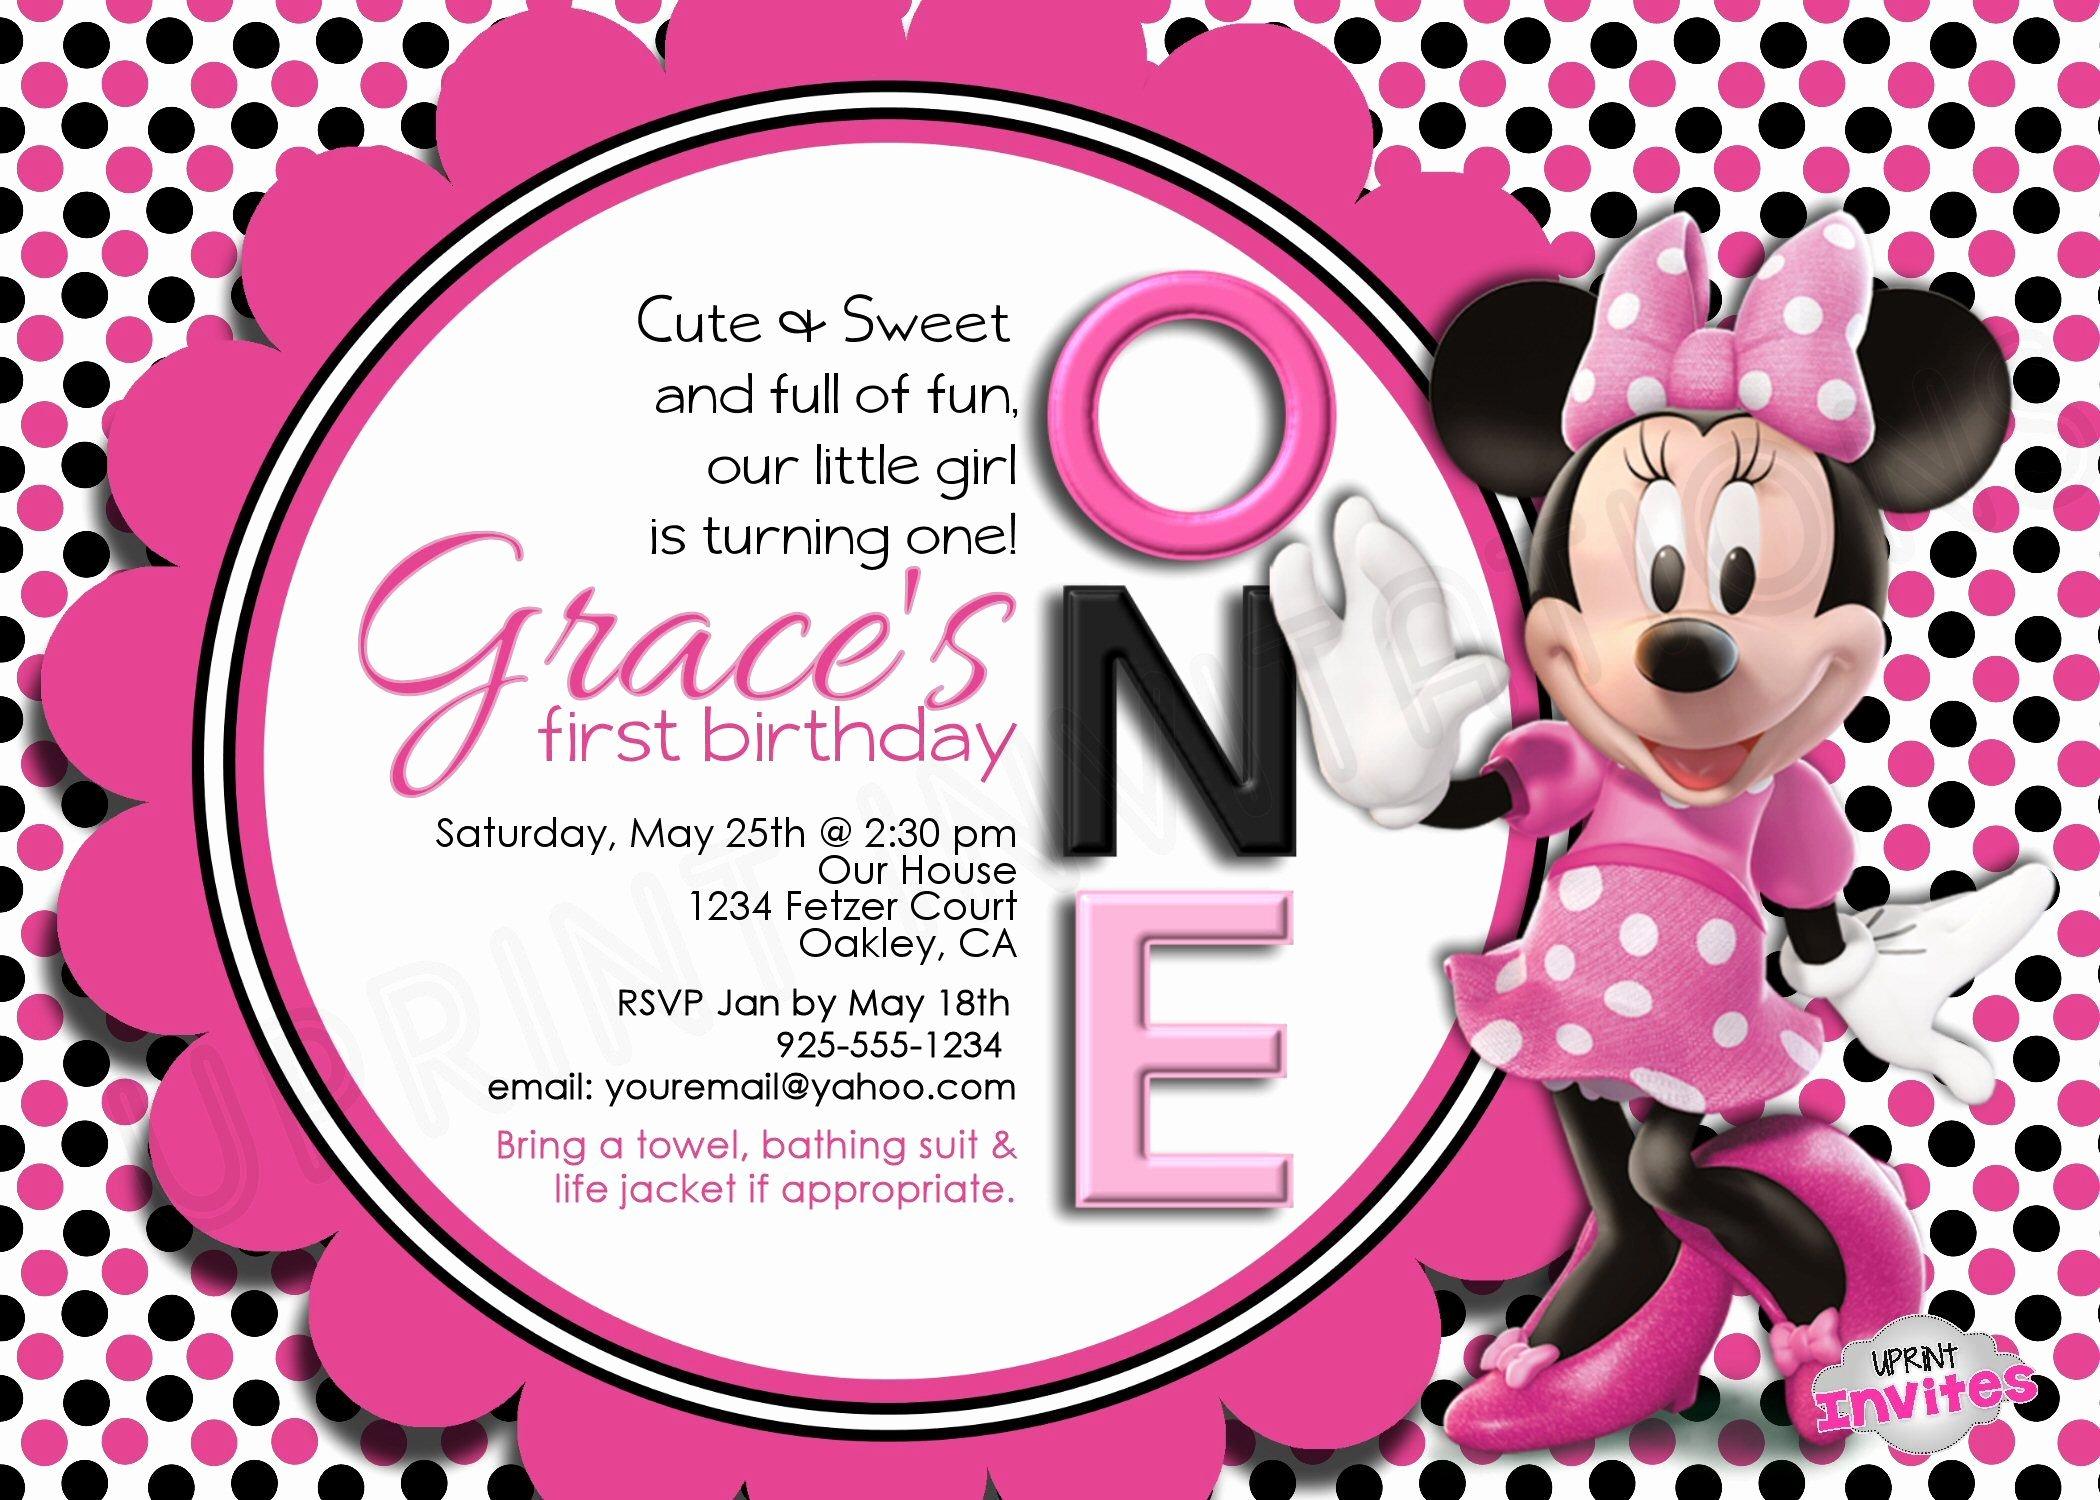 Minnie Mouse Personalized Invitations Elegant Minnie Mouse Personalized Invitation Uprintinvitations Invites Invitation